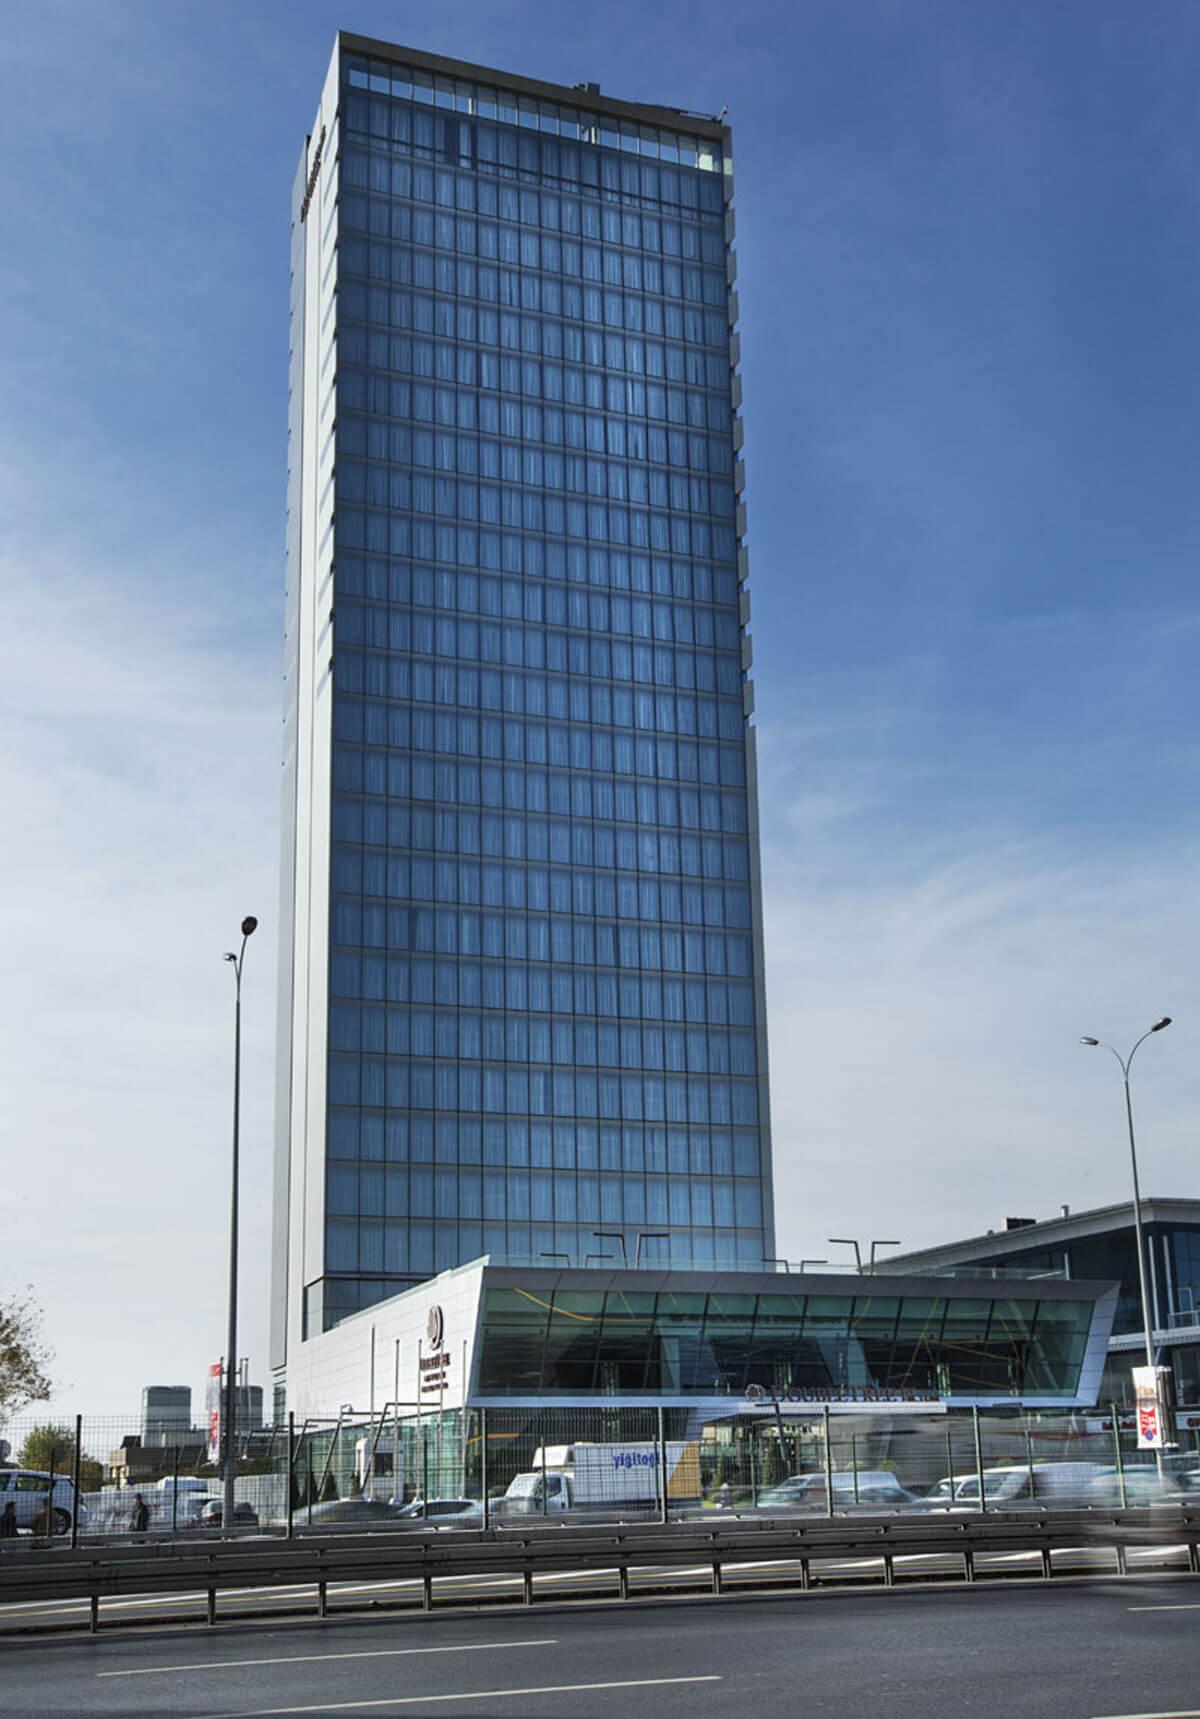 Hilton11